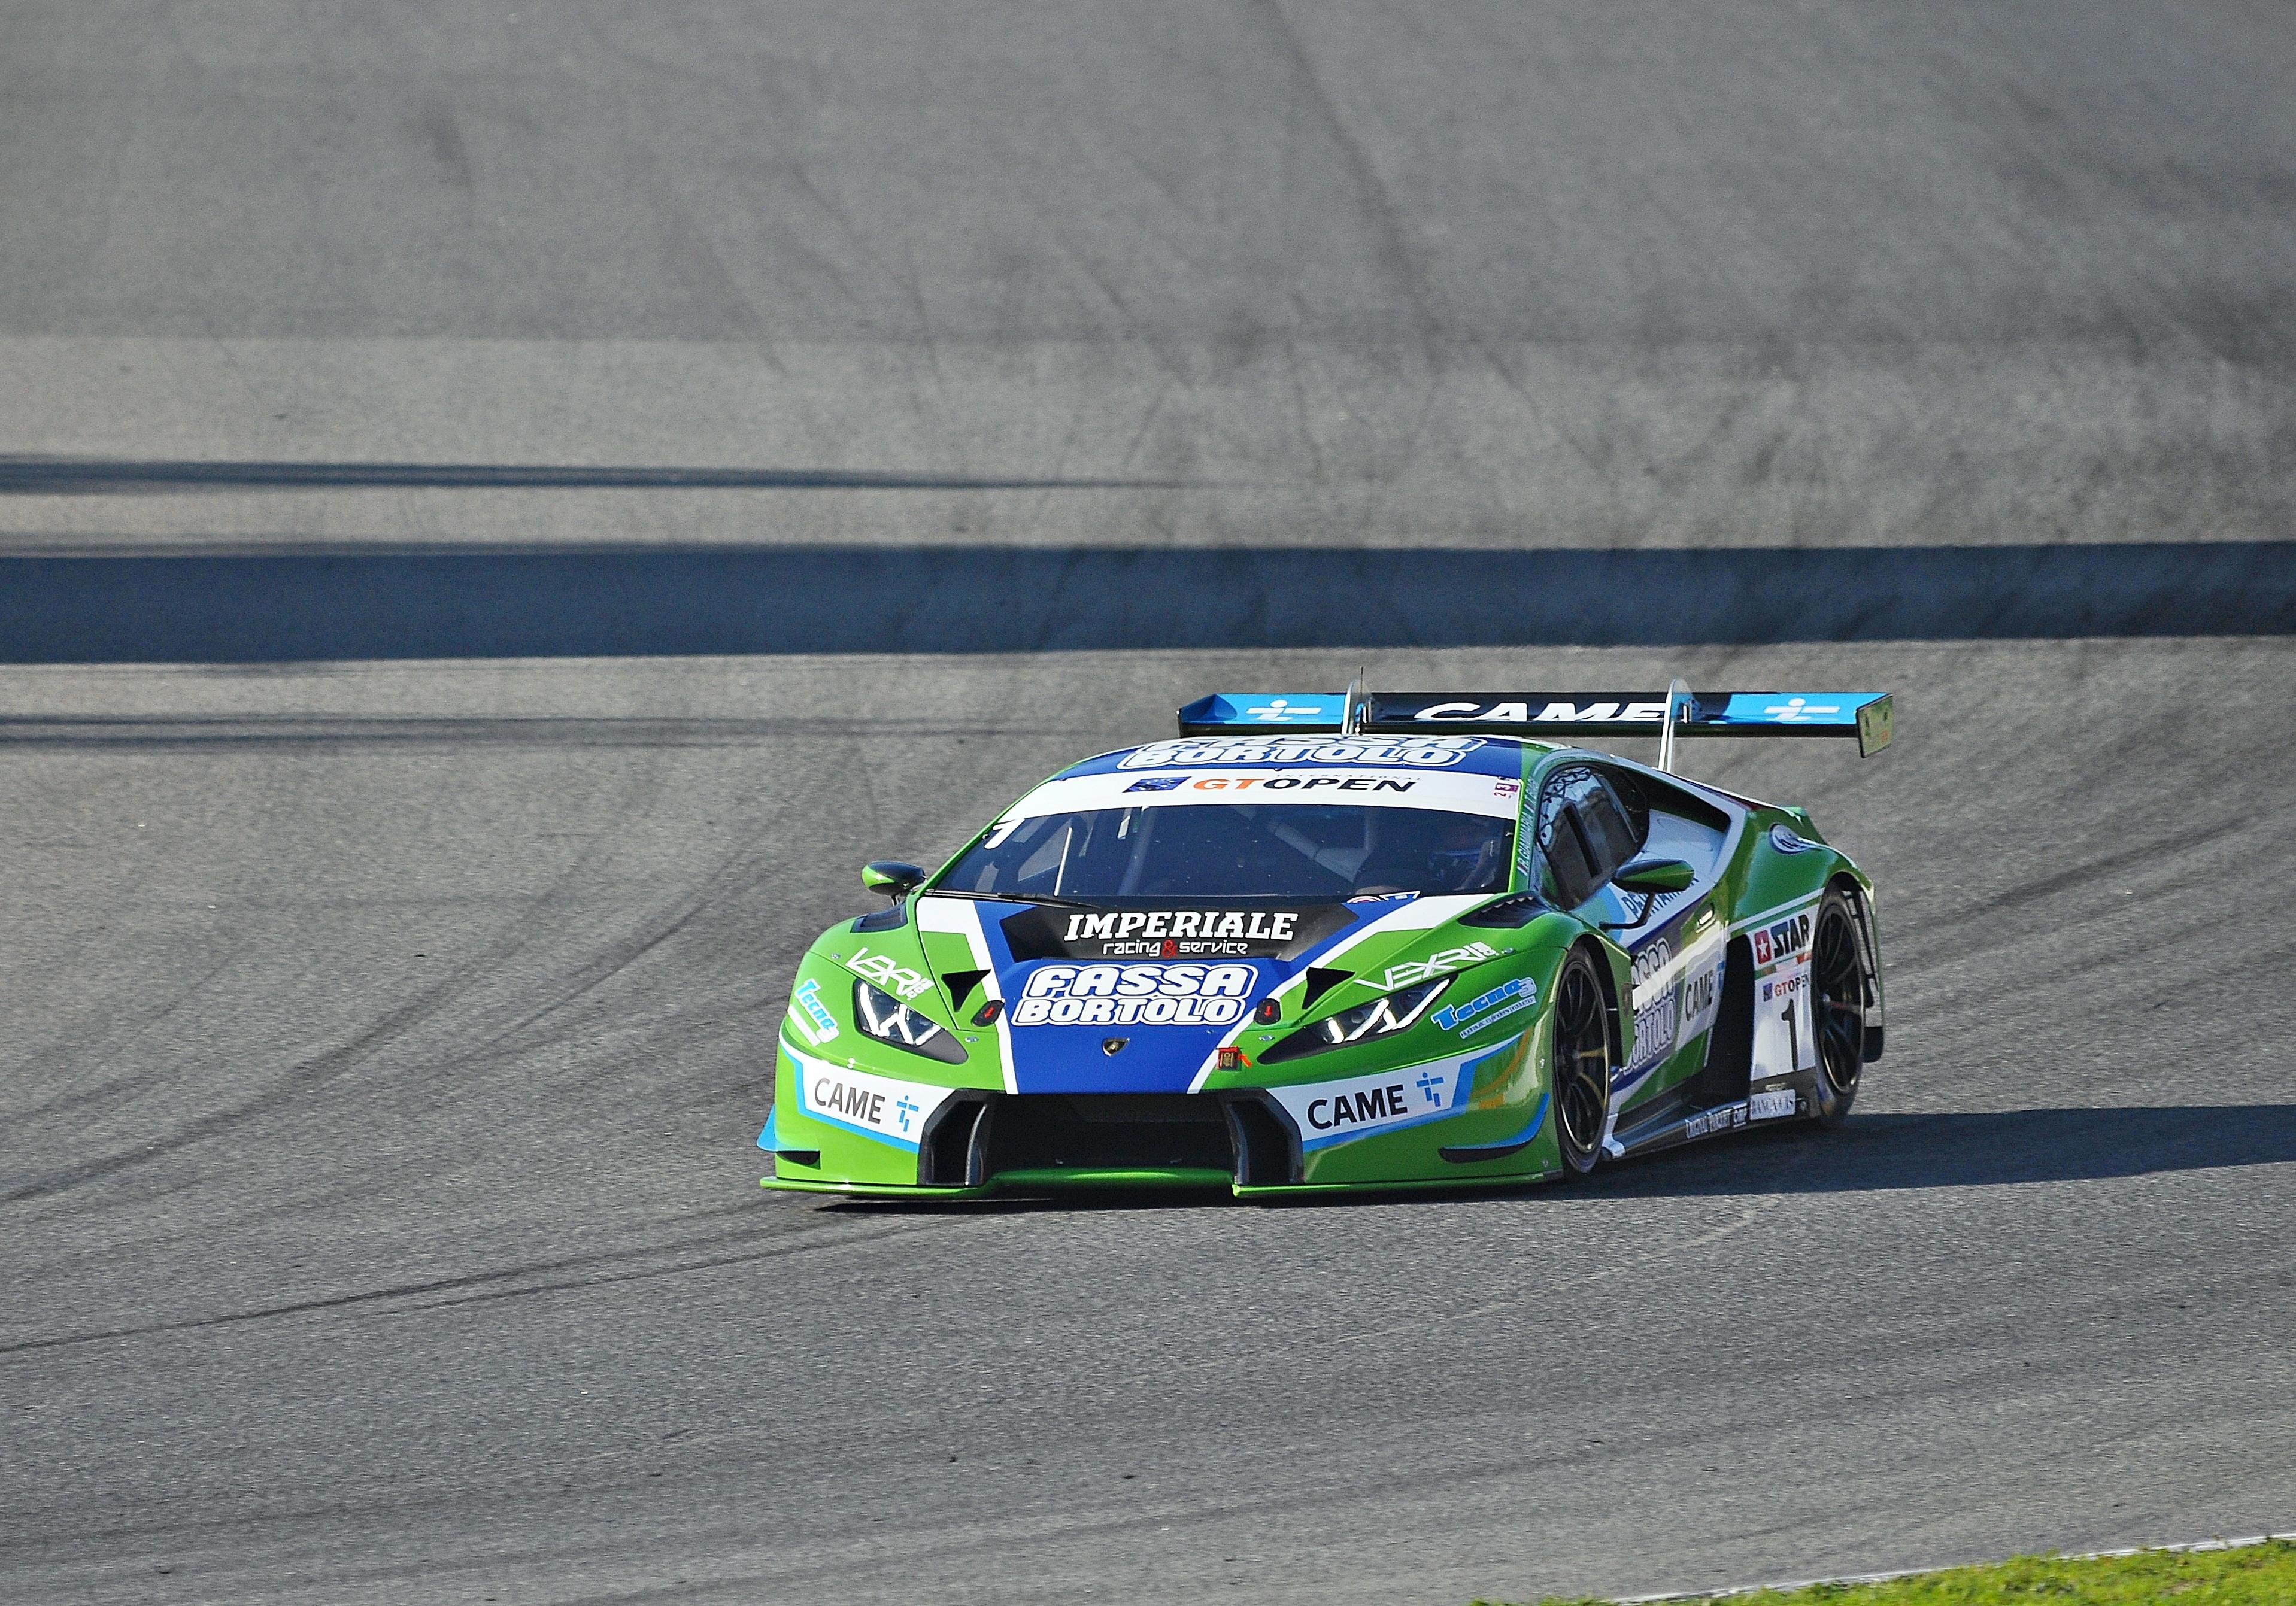 Lamborghini Huracan on a race track